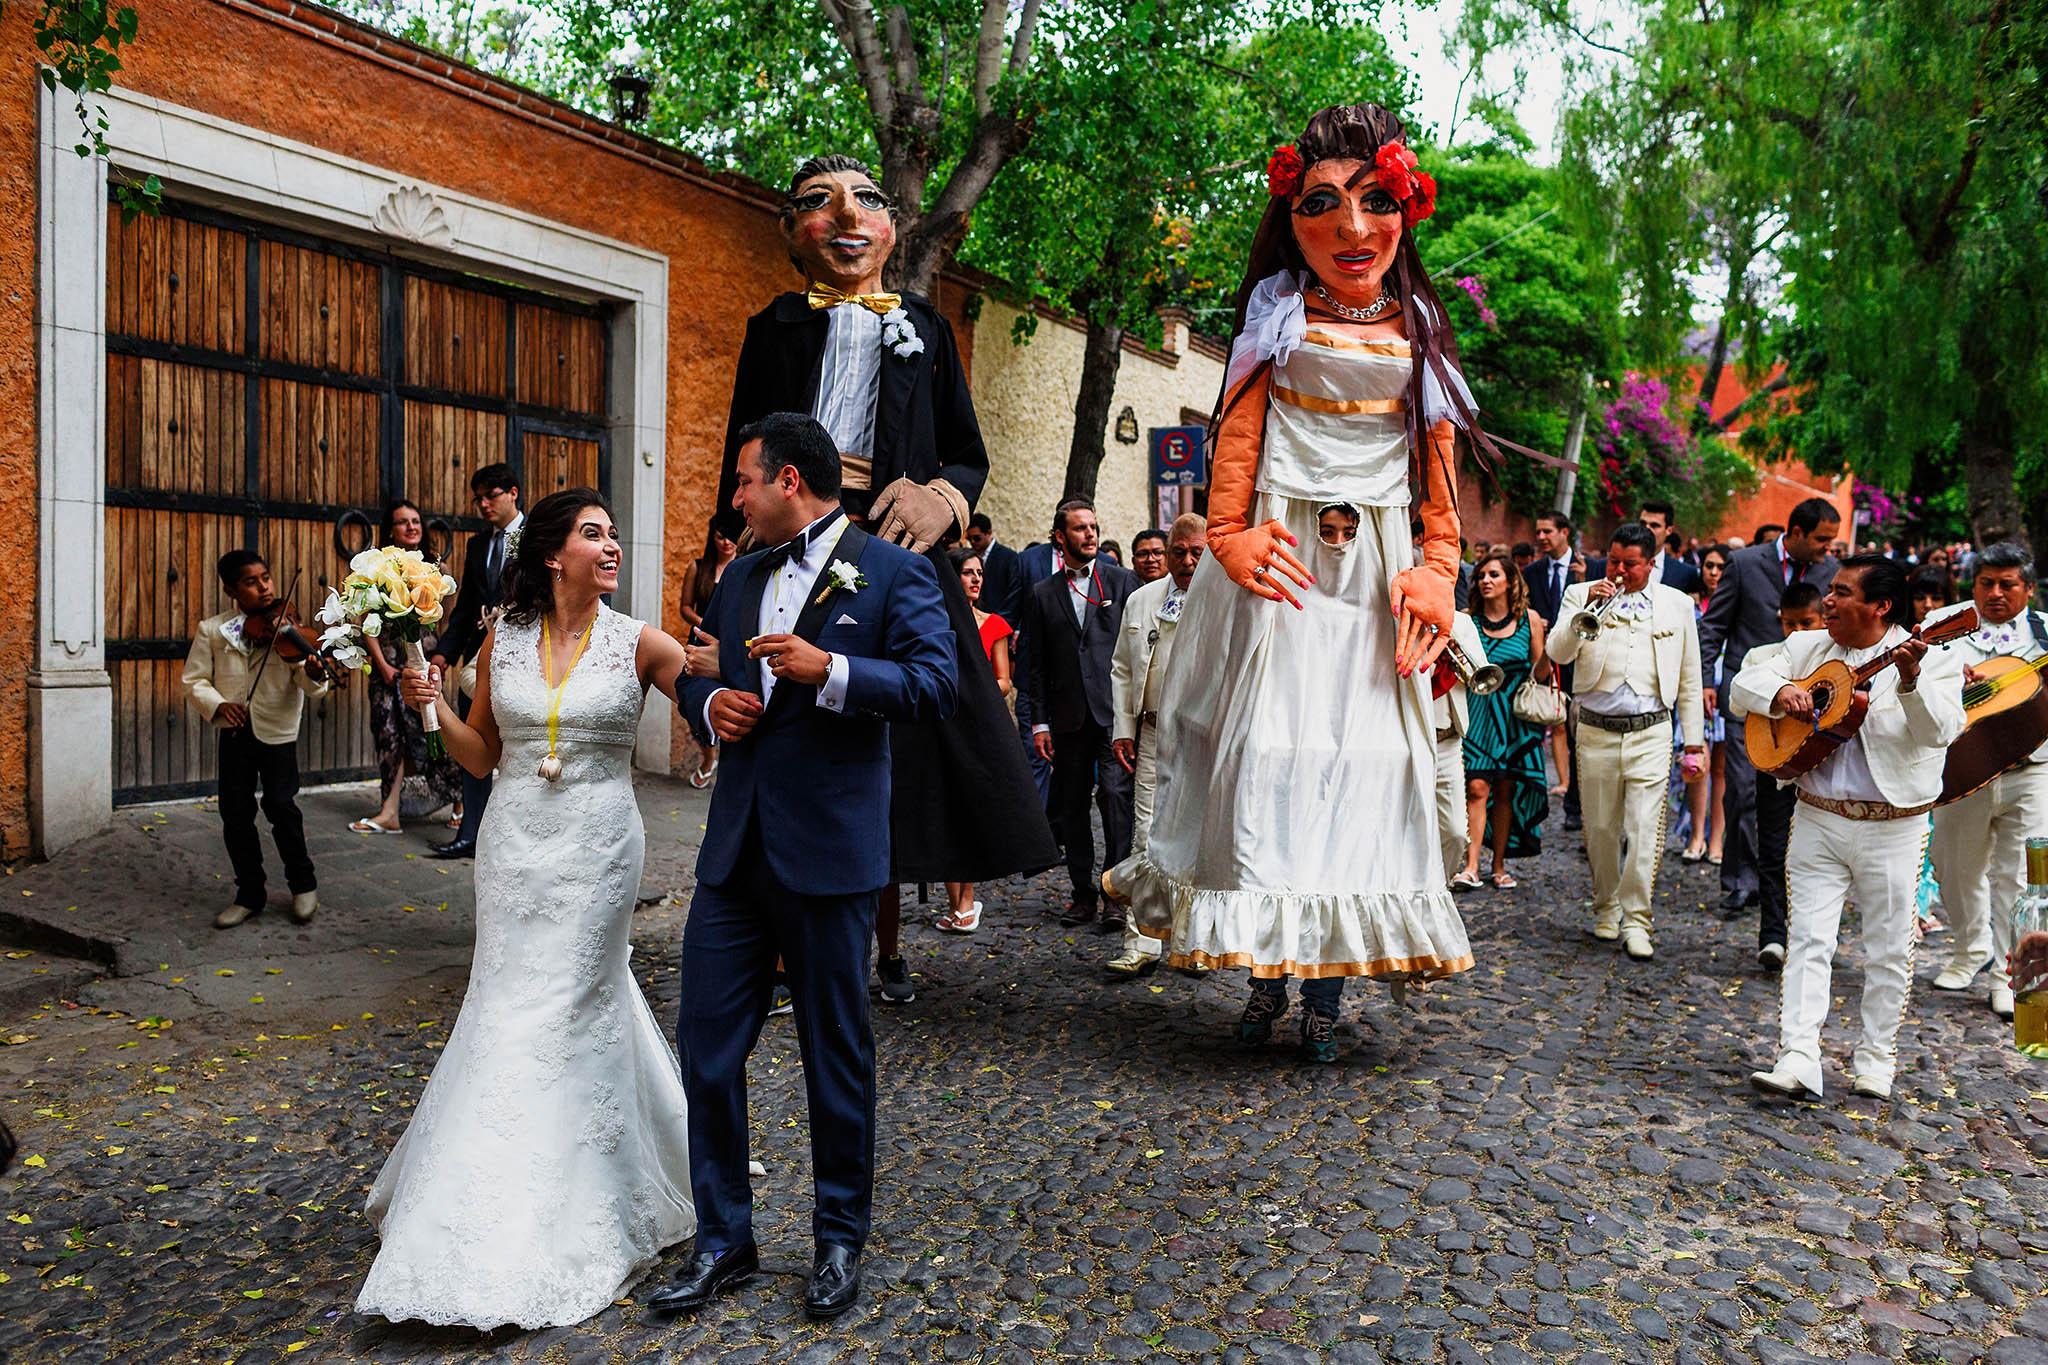 Getting married in San Miguel de Allende